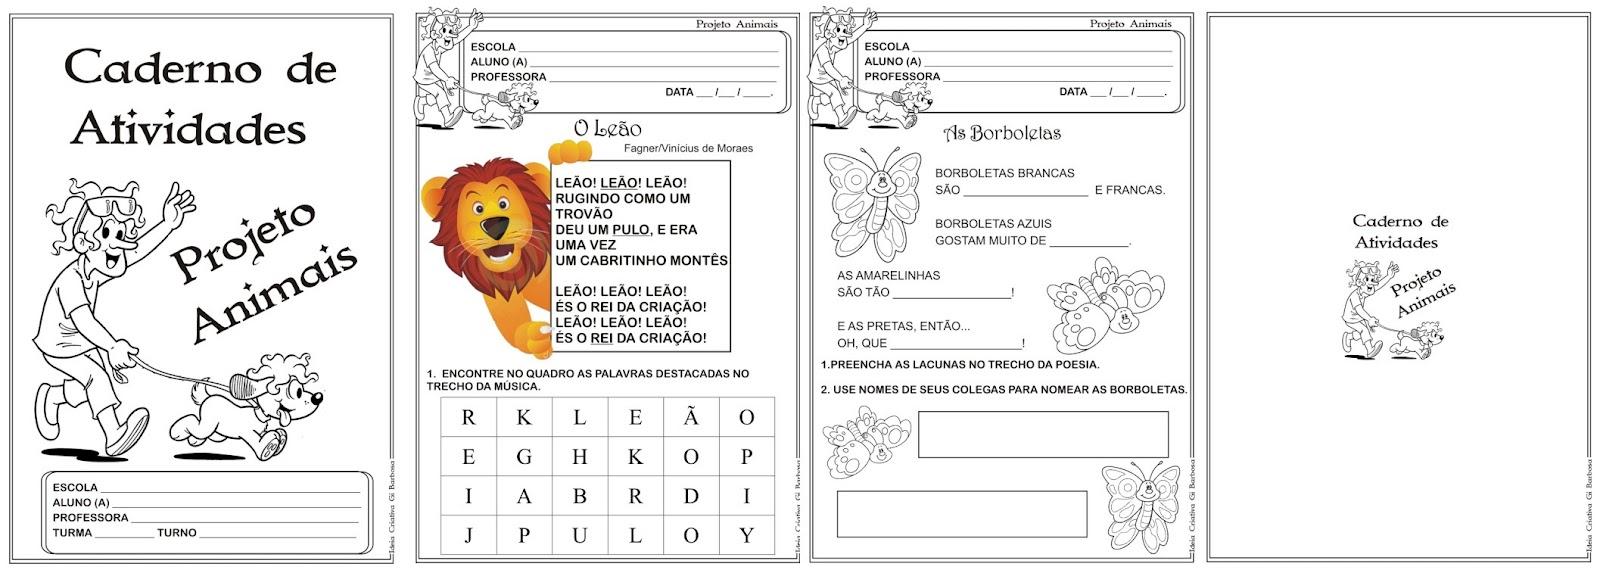 Fabuloso Caderno de Atividades Projeto Animais Poesias de Vinicius de Moraes XW76